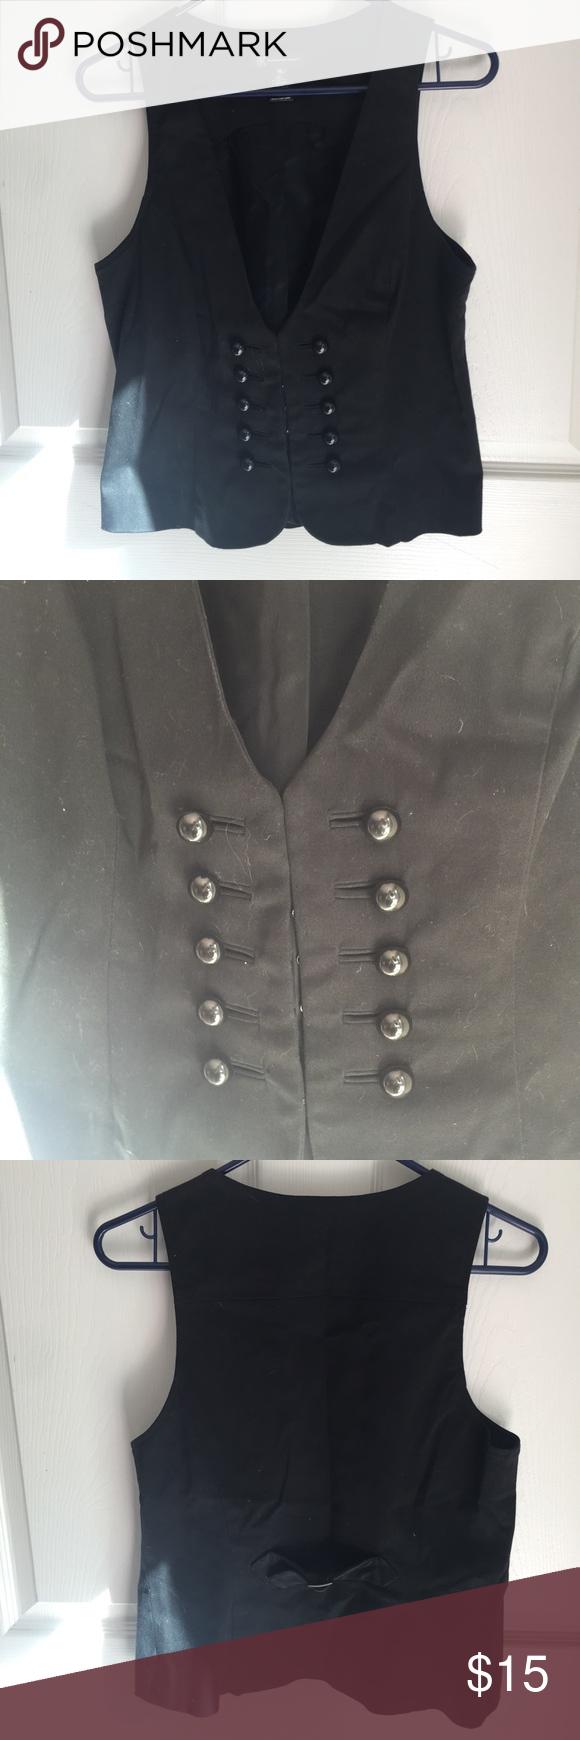 Black vest All black best with buttons. INC International Concepts Jackets & Coats Vests